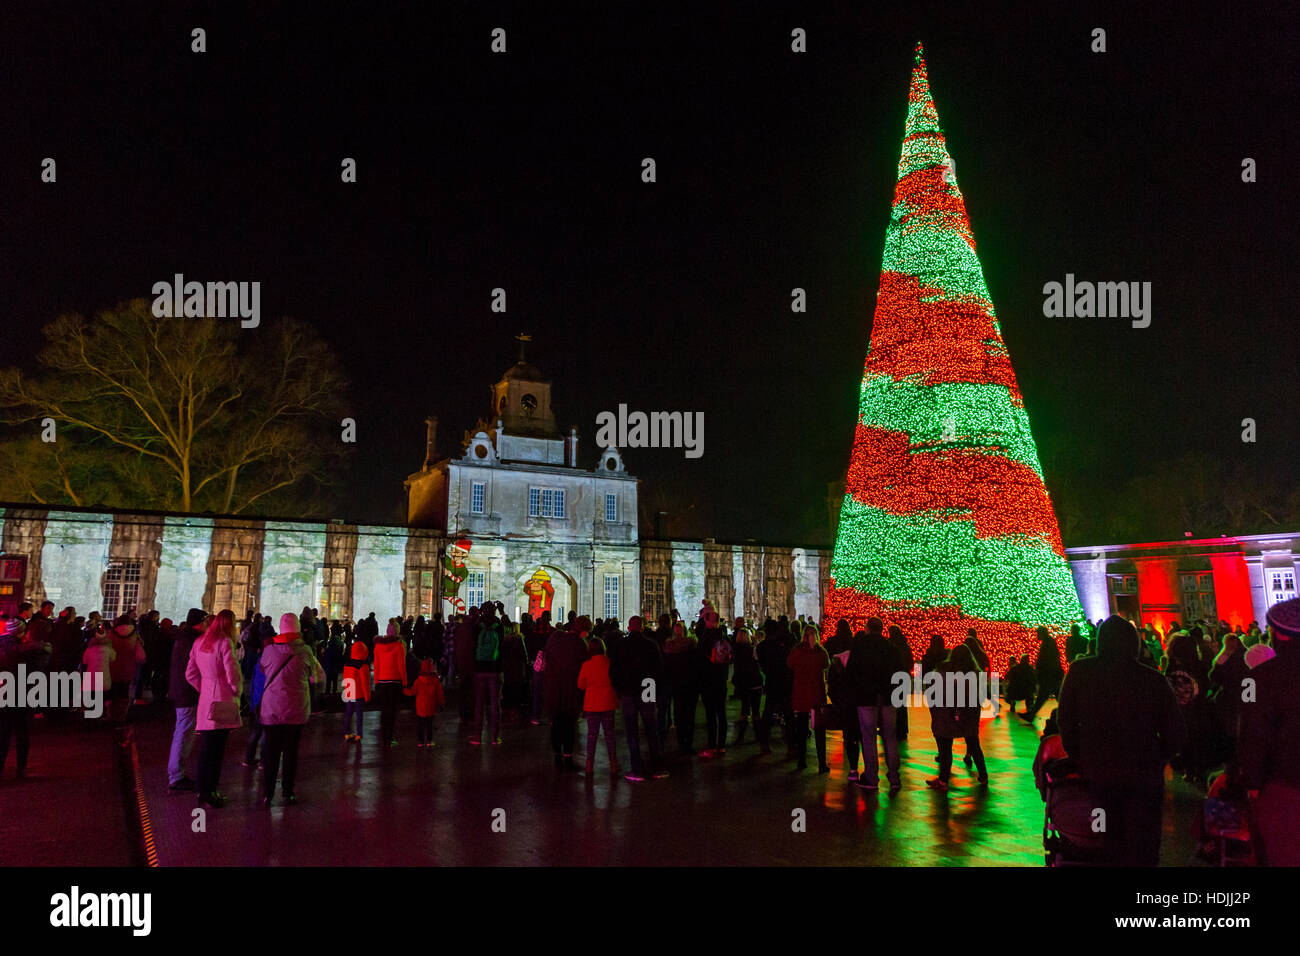 longleat festival of light singing christmas tree light show stock image - Singing Christmas Tree Lights